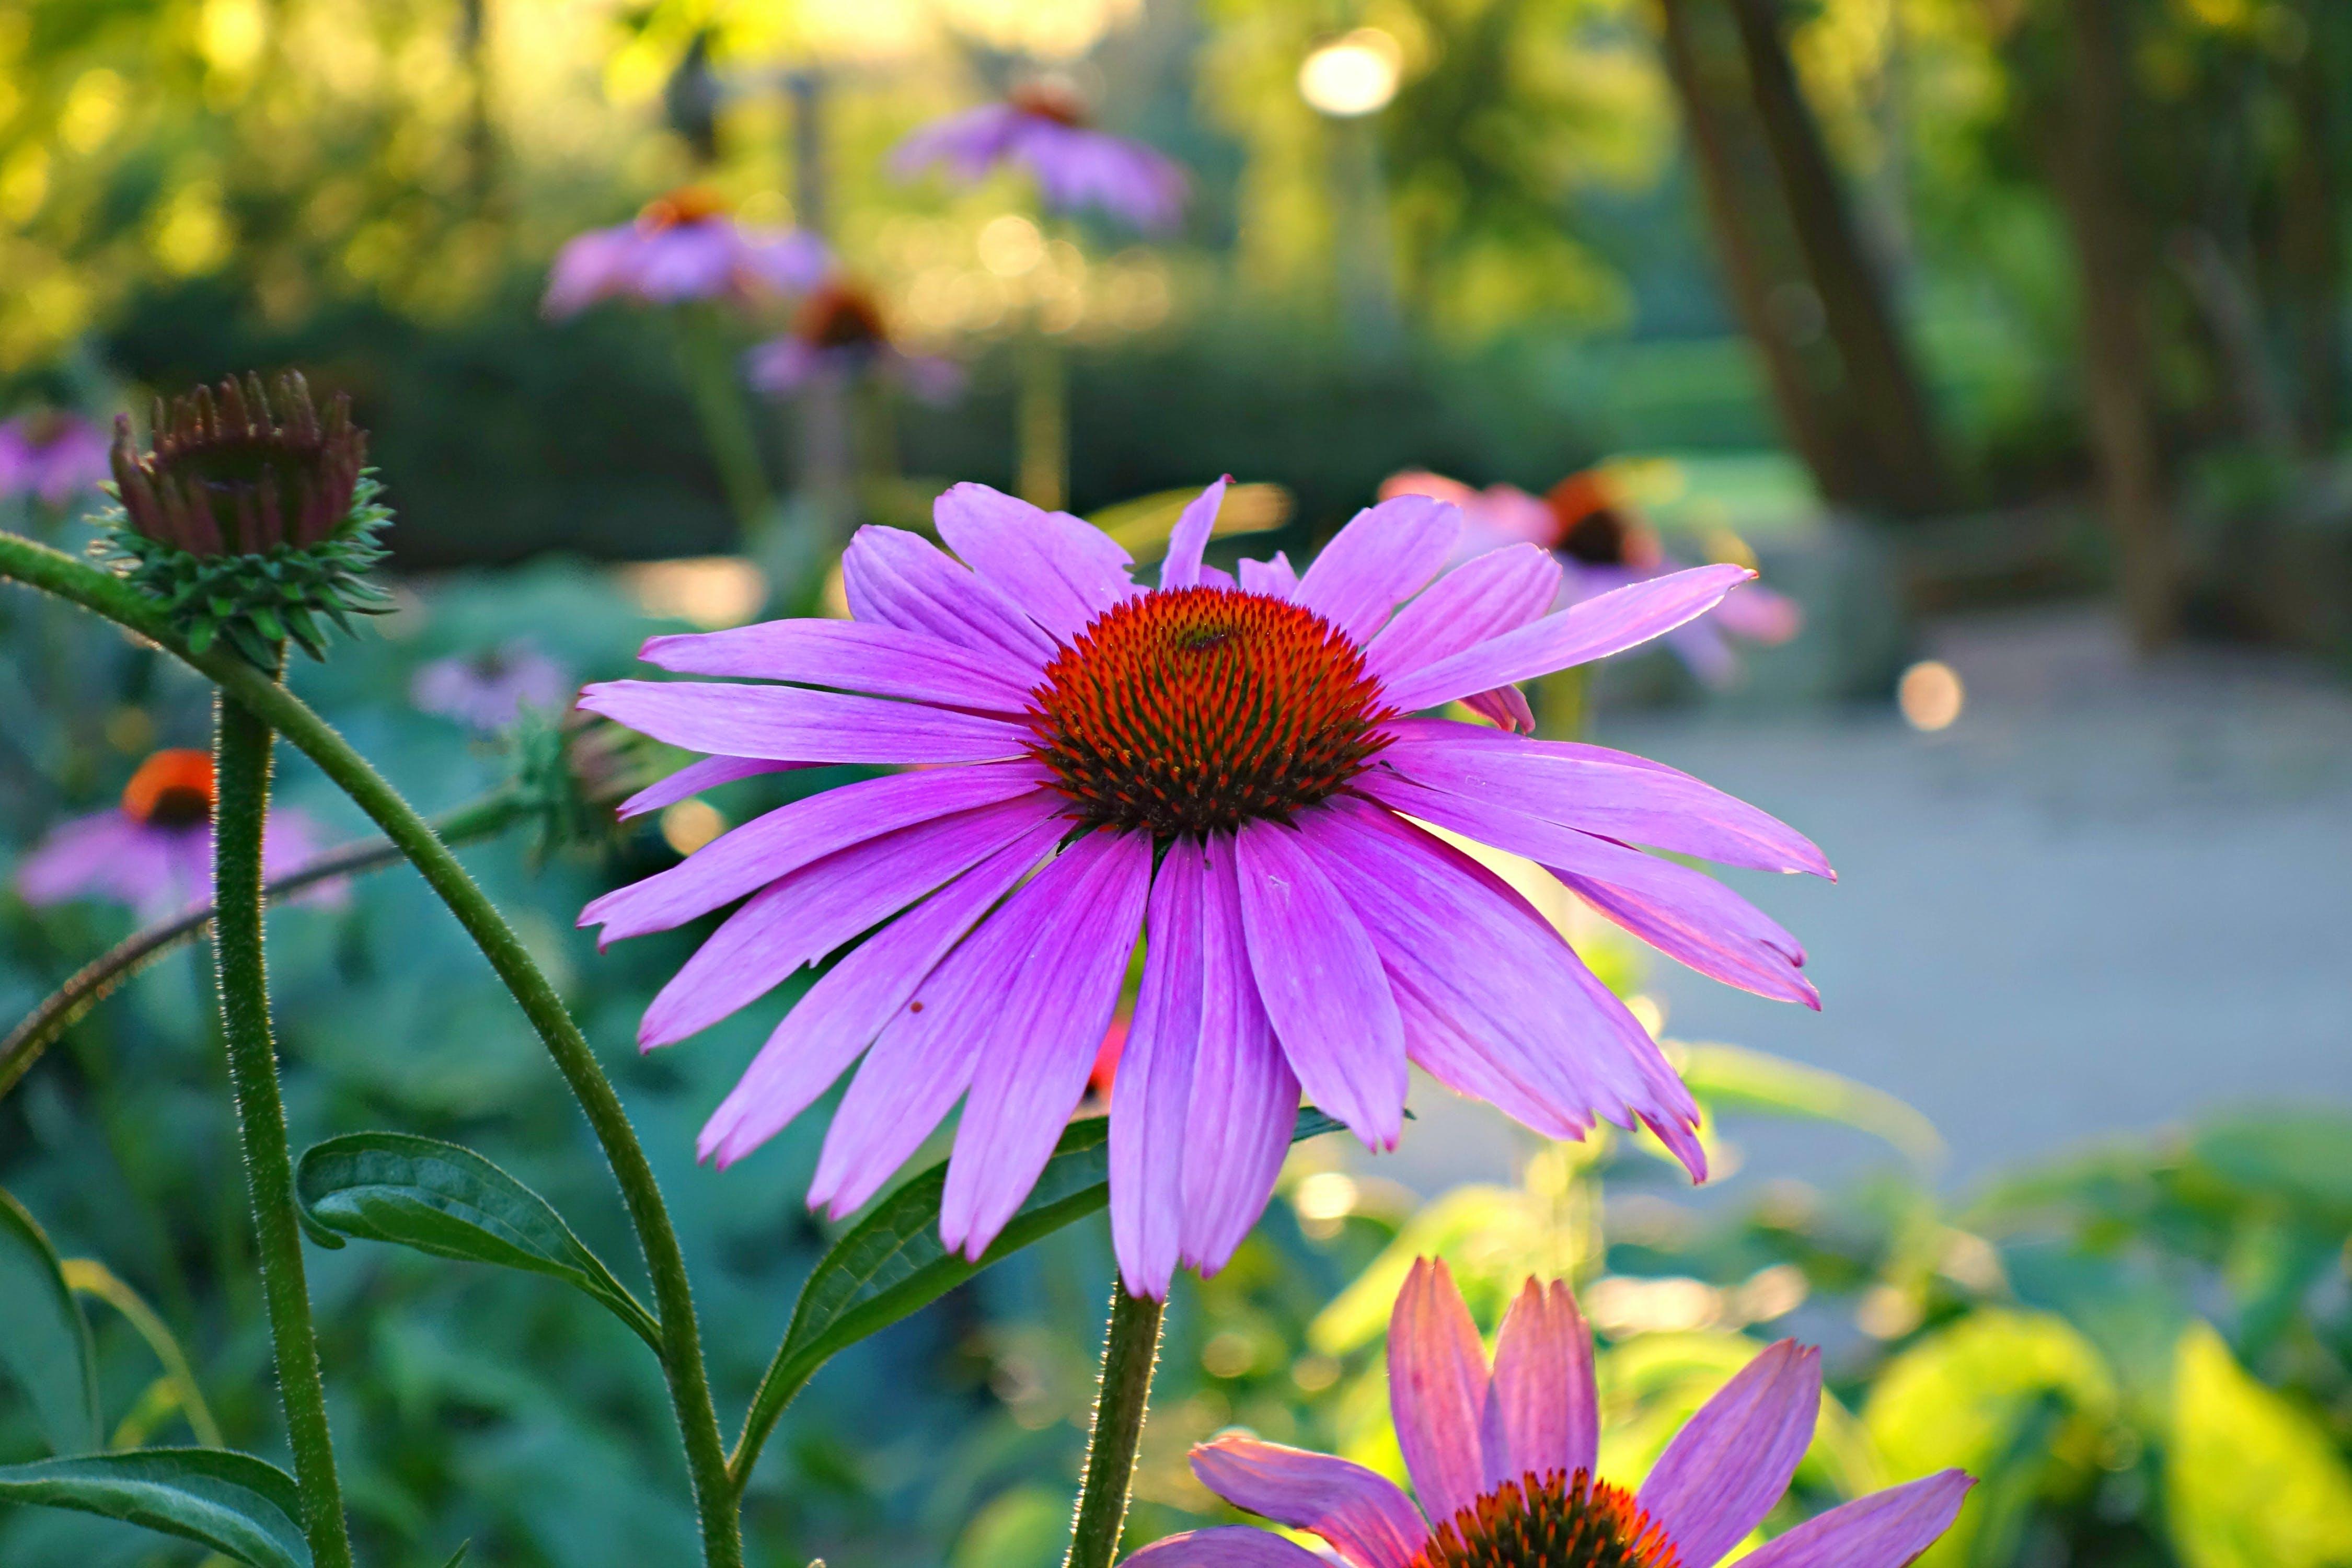 Free stock photo of summer, garden, plant, flower